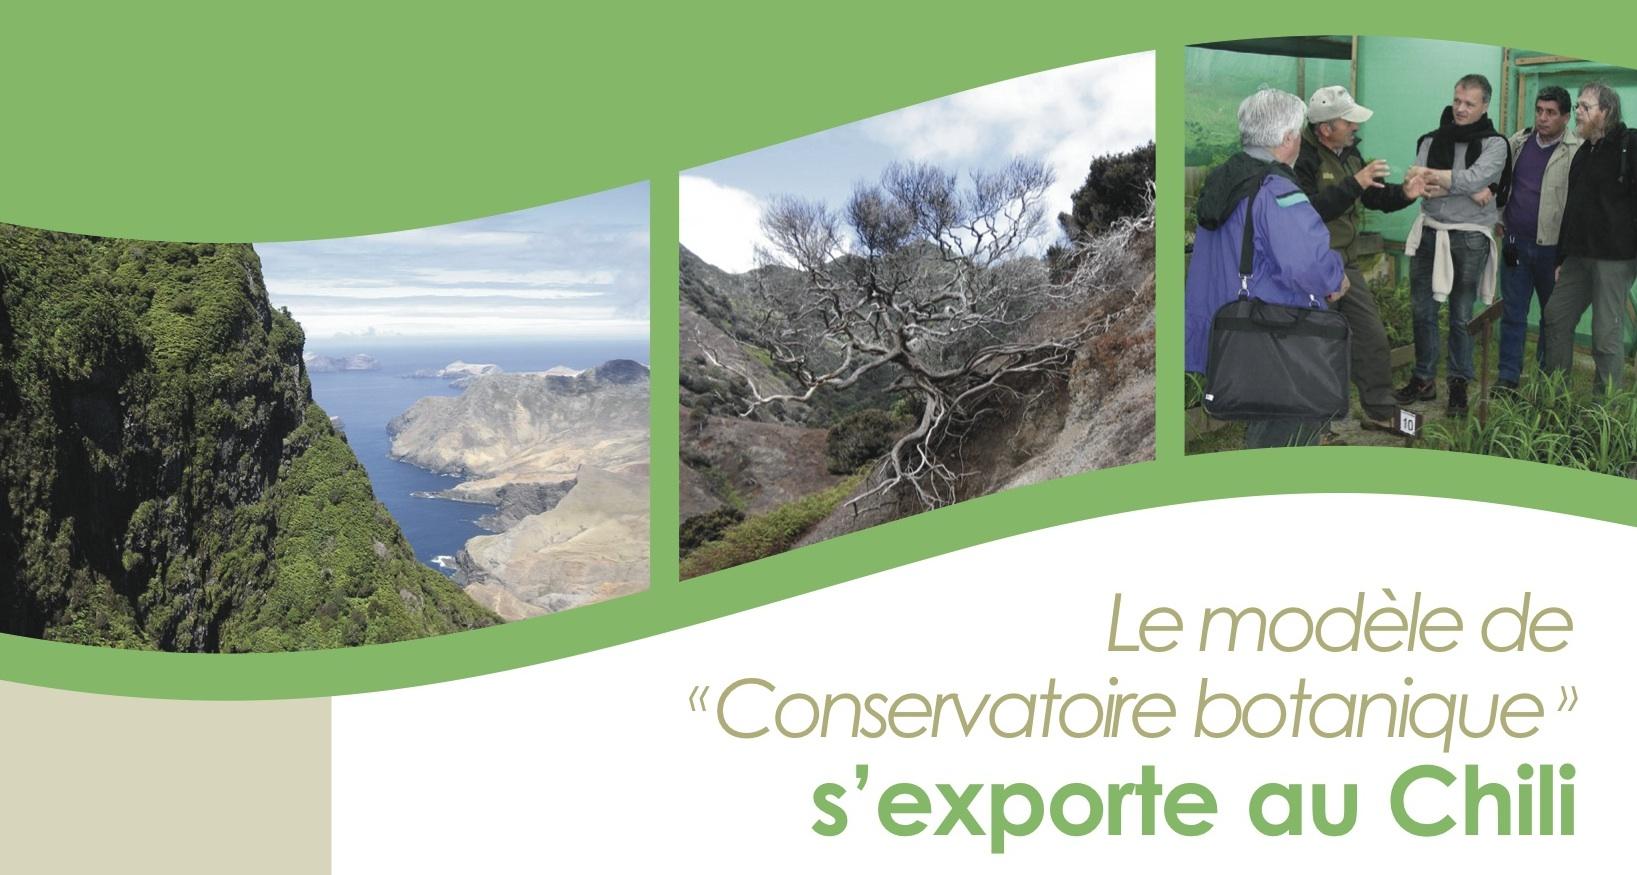 coop botanica Juan Fernandez recortada arriba